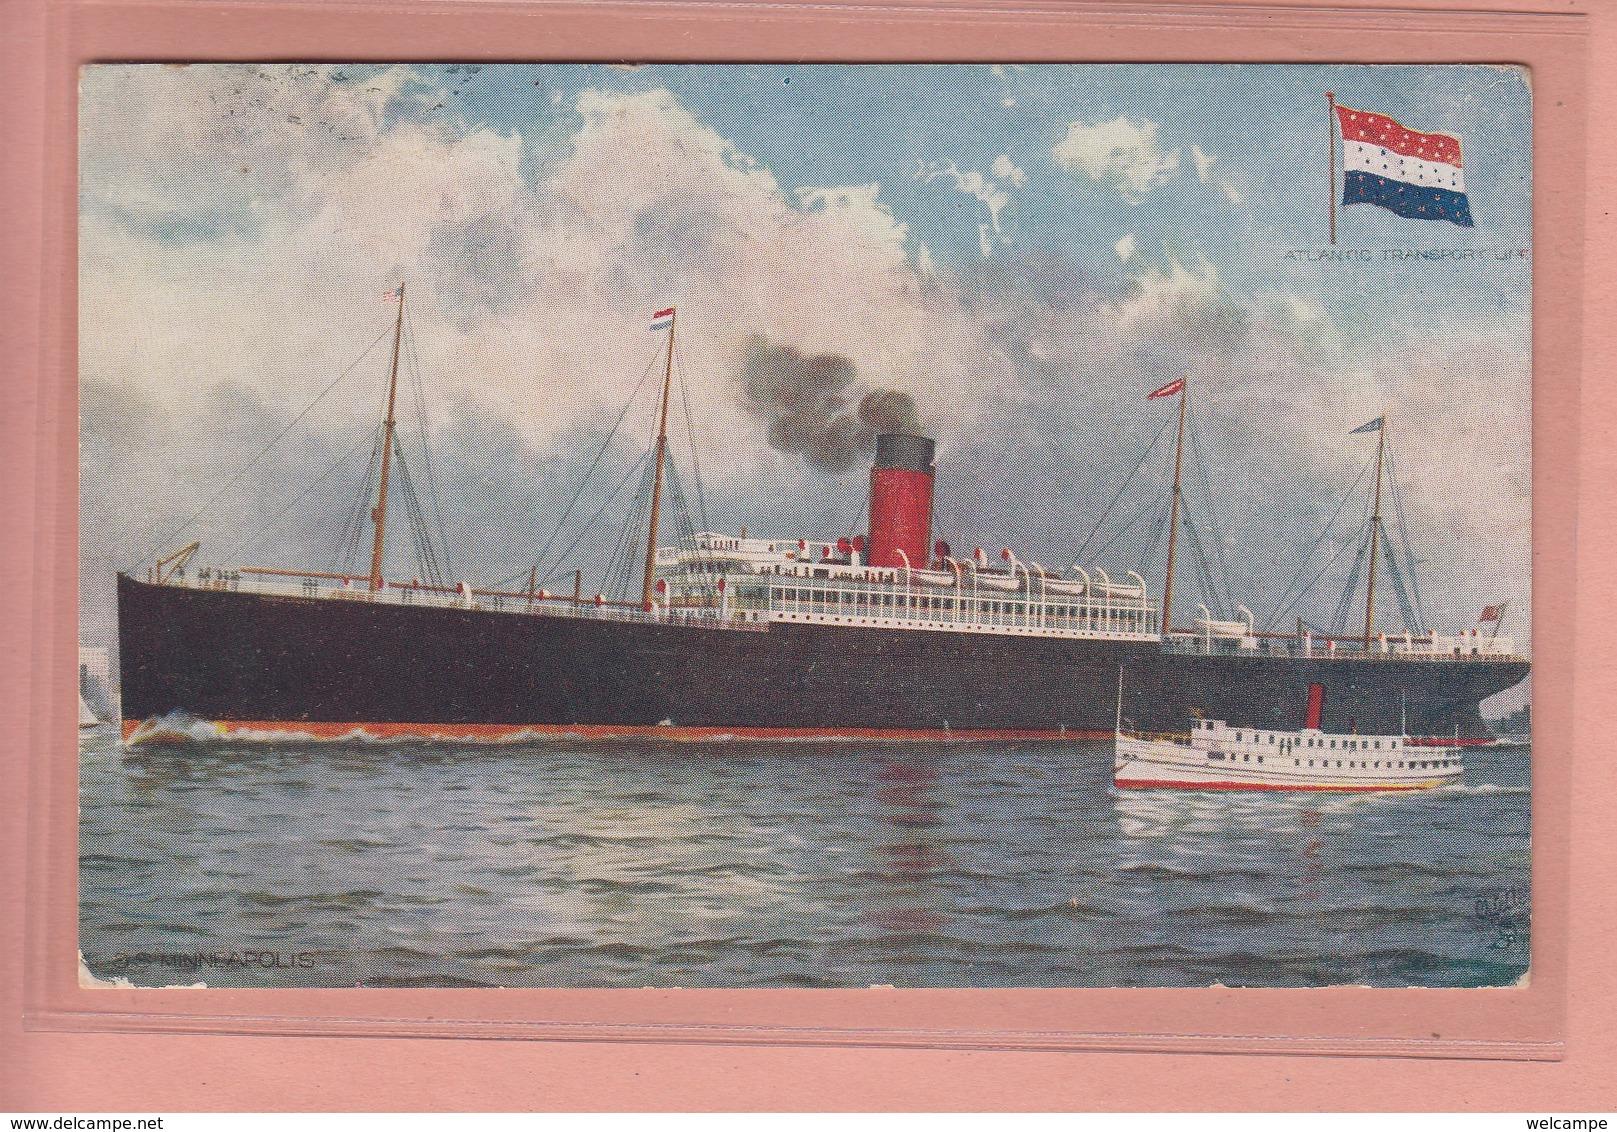 OLD POSTCARD - SHIPPING -   ATLANTIC TRANSPORT - S.S. MINNEAPOLIS - Paquebots